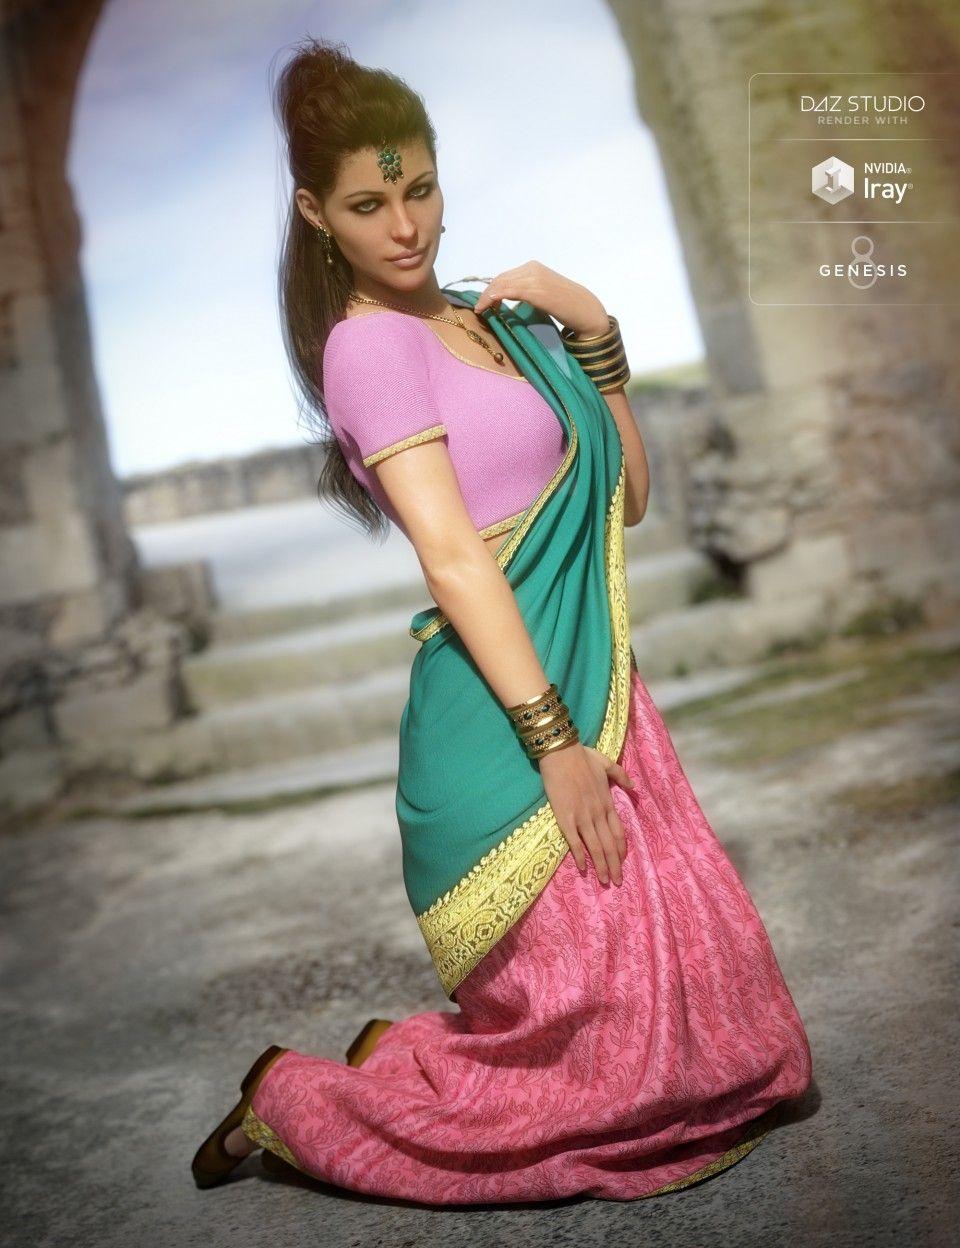 Saree for Genesis 8 Female and Victoria 8 | Daz Poser | Saree